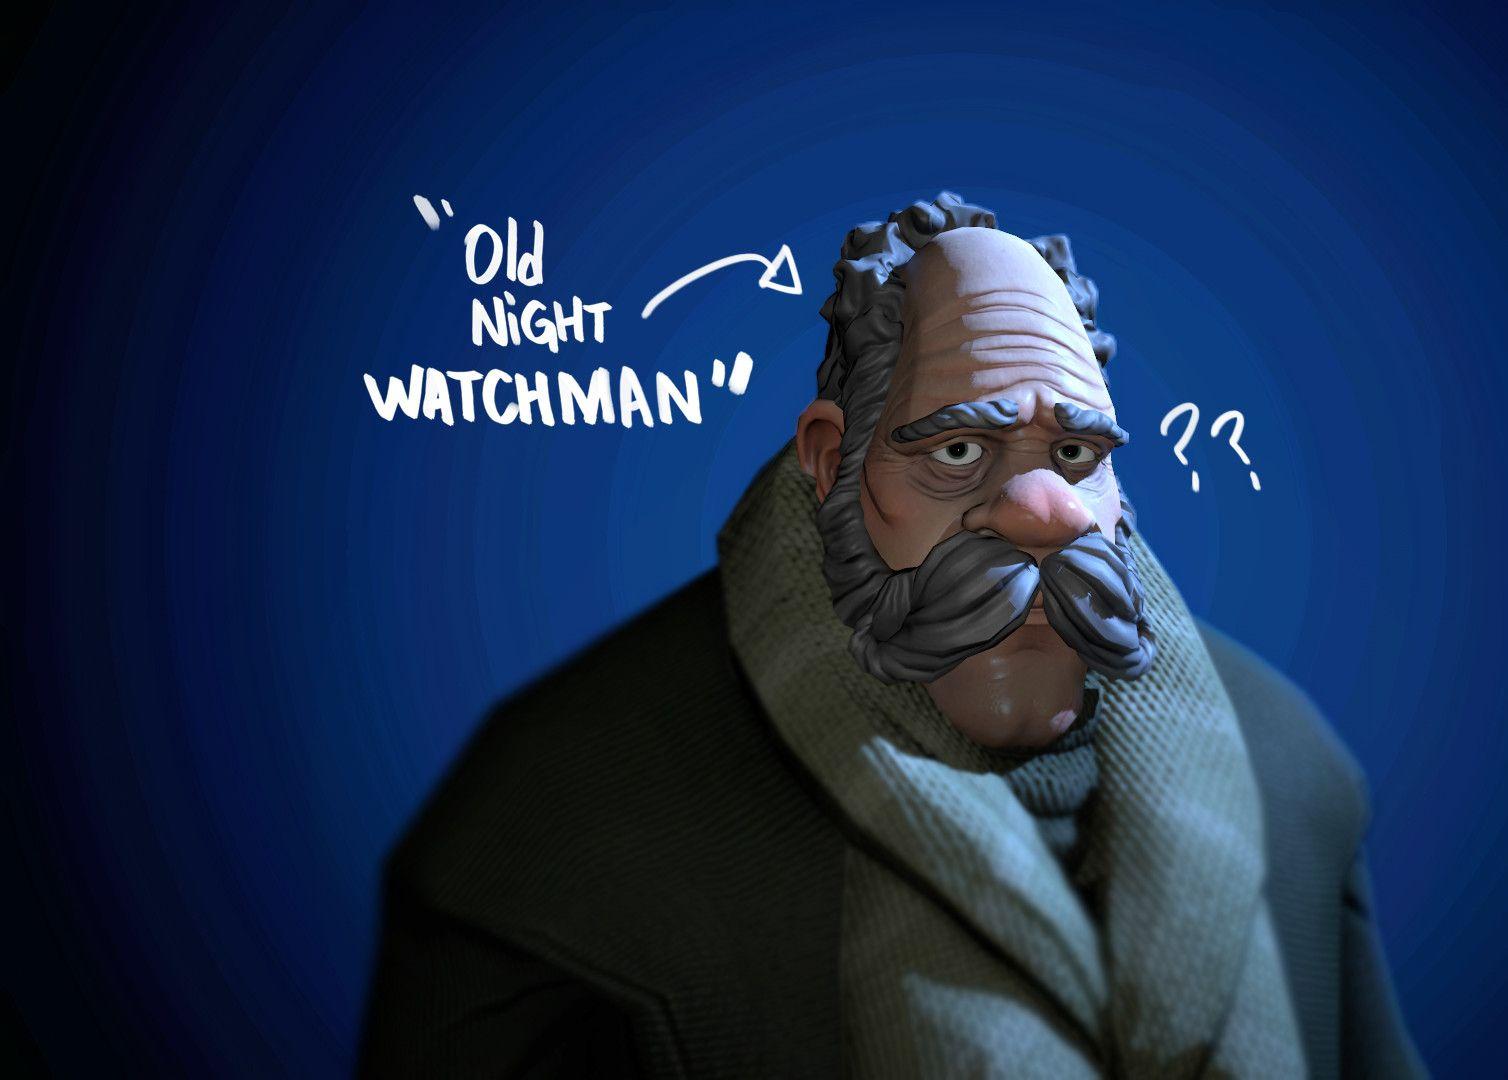 Old Night Watchman, Nicolas Guillet on ArtStation at https://www.artstation.com/artwork/qZnXL